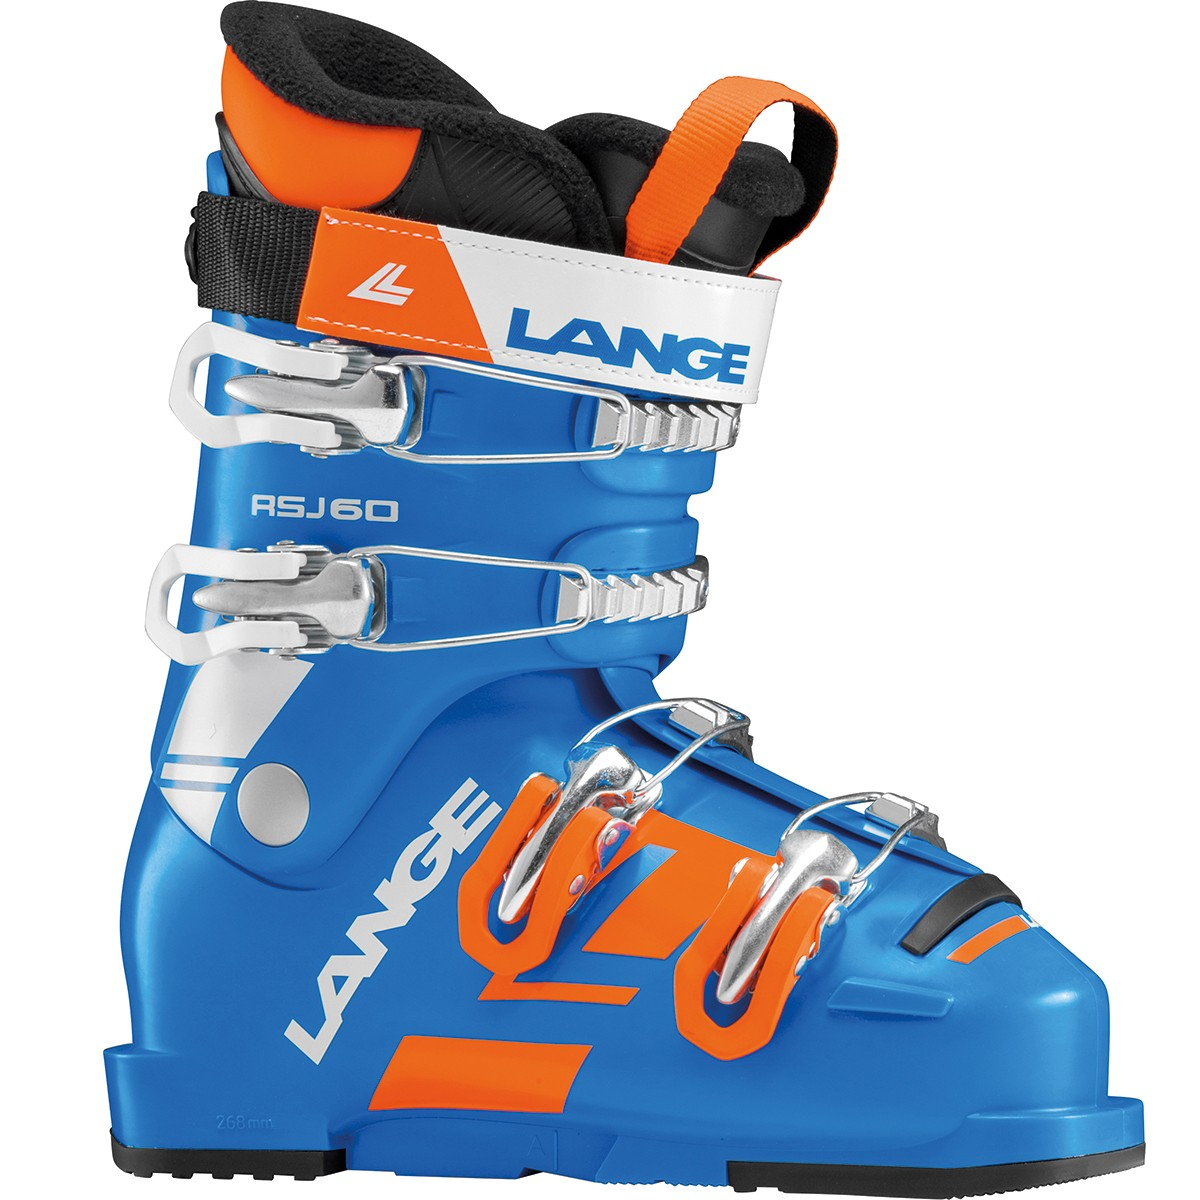 Scarponi sci Lange Rsj 60 (Colore: blu-arancio, Taglia: 19.5)